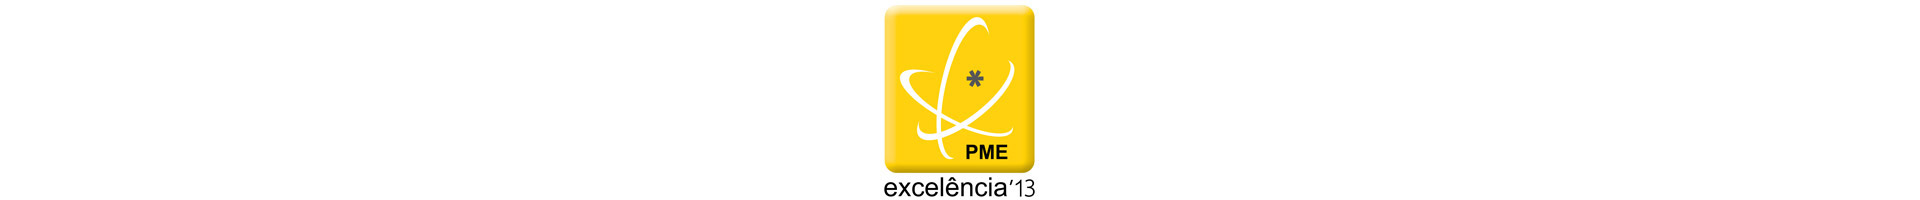 PME-Excelencia_frontpage1920